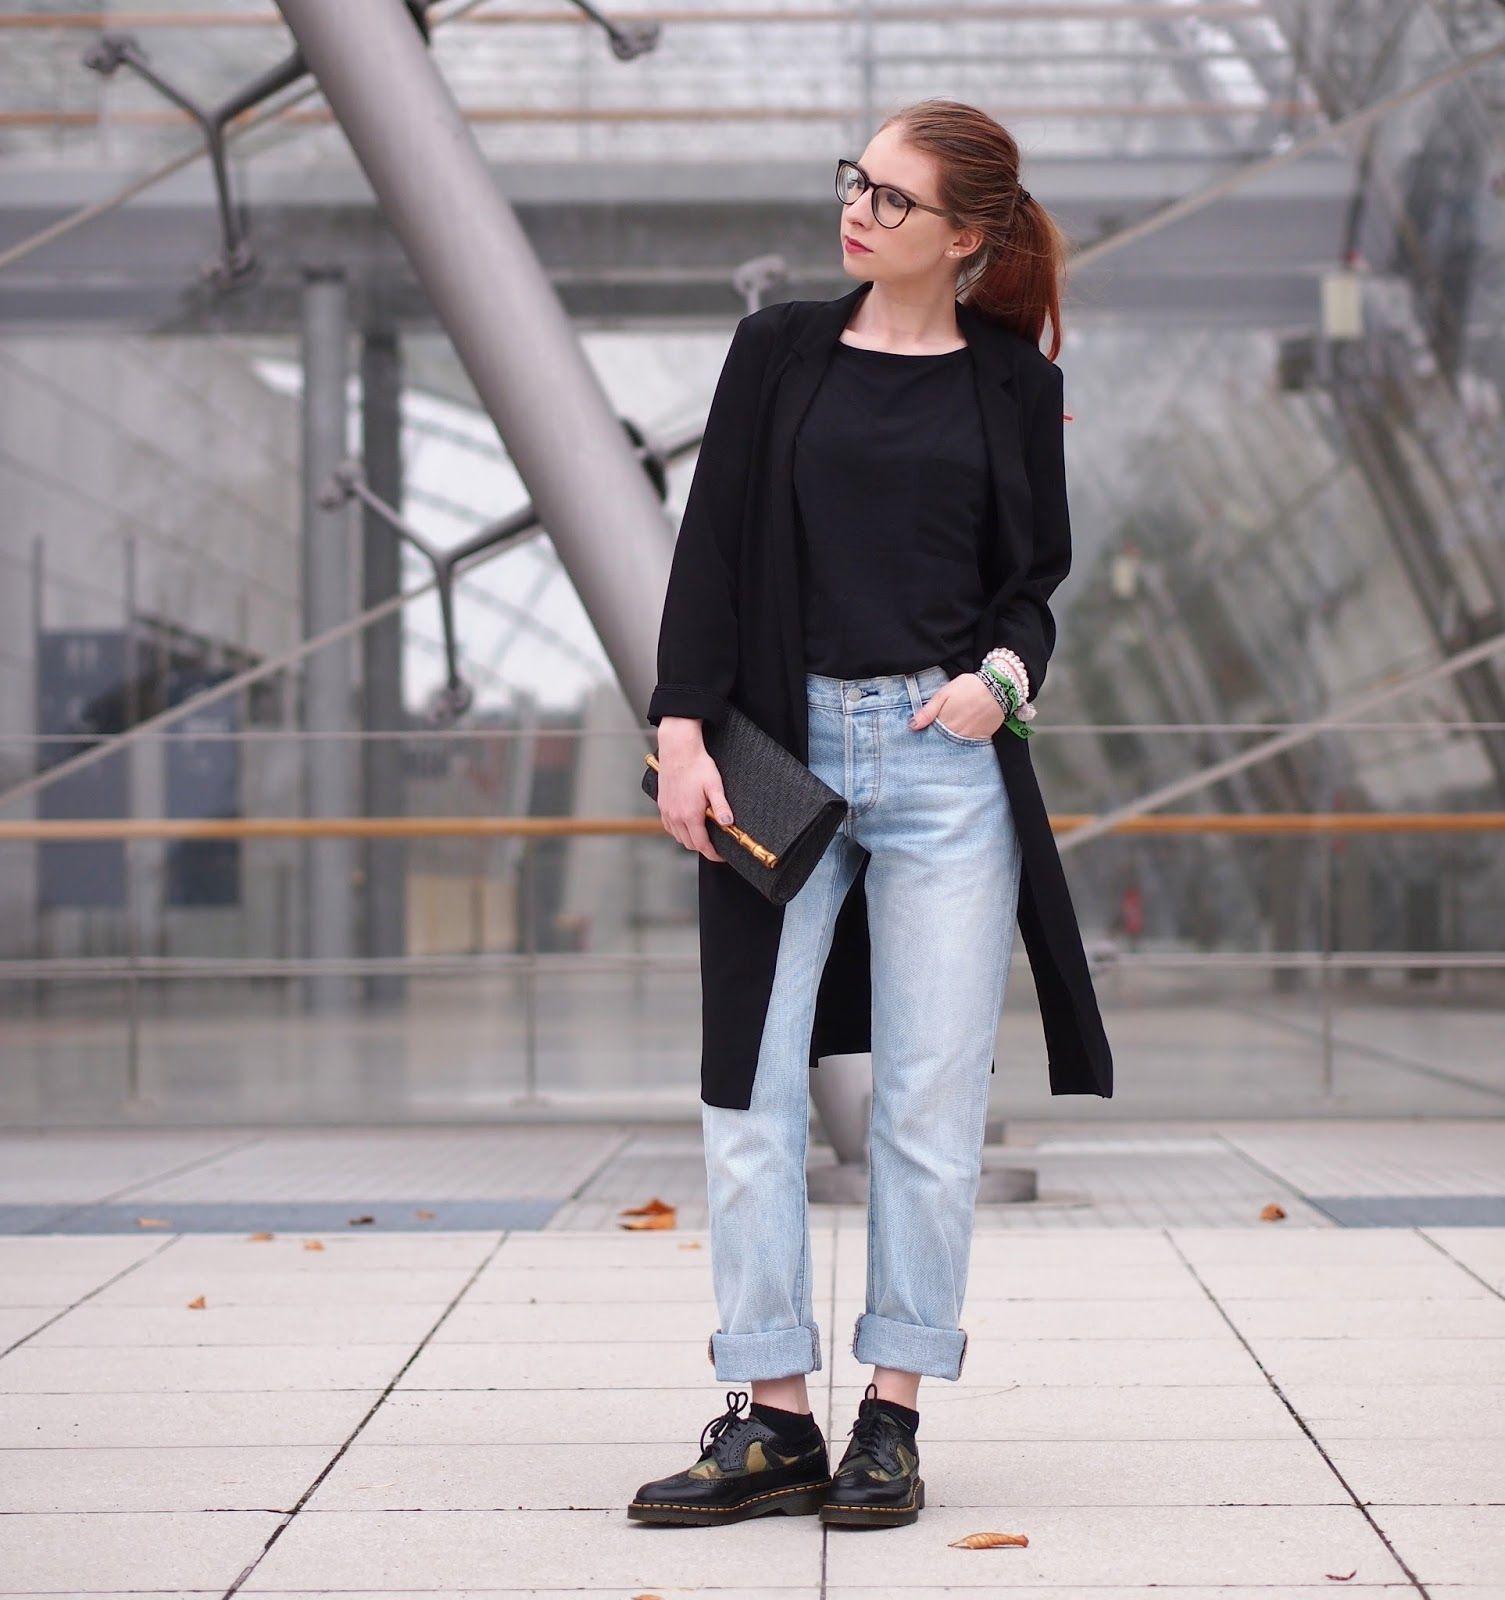 Black t shirt outfit - Outfit Levi S 501 Jeans Und Dr Martens Schn Rschuhe The Fashionable Blog